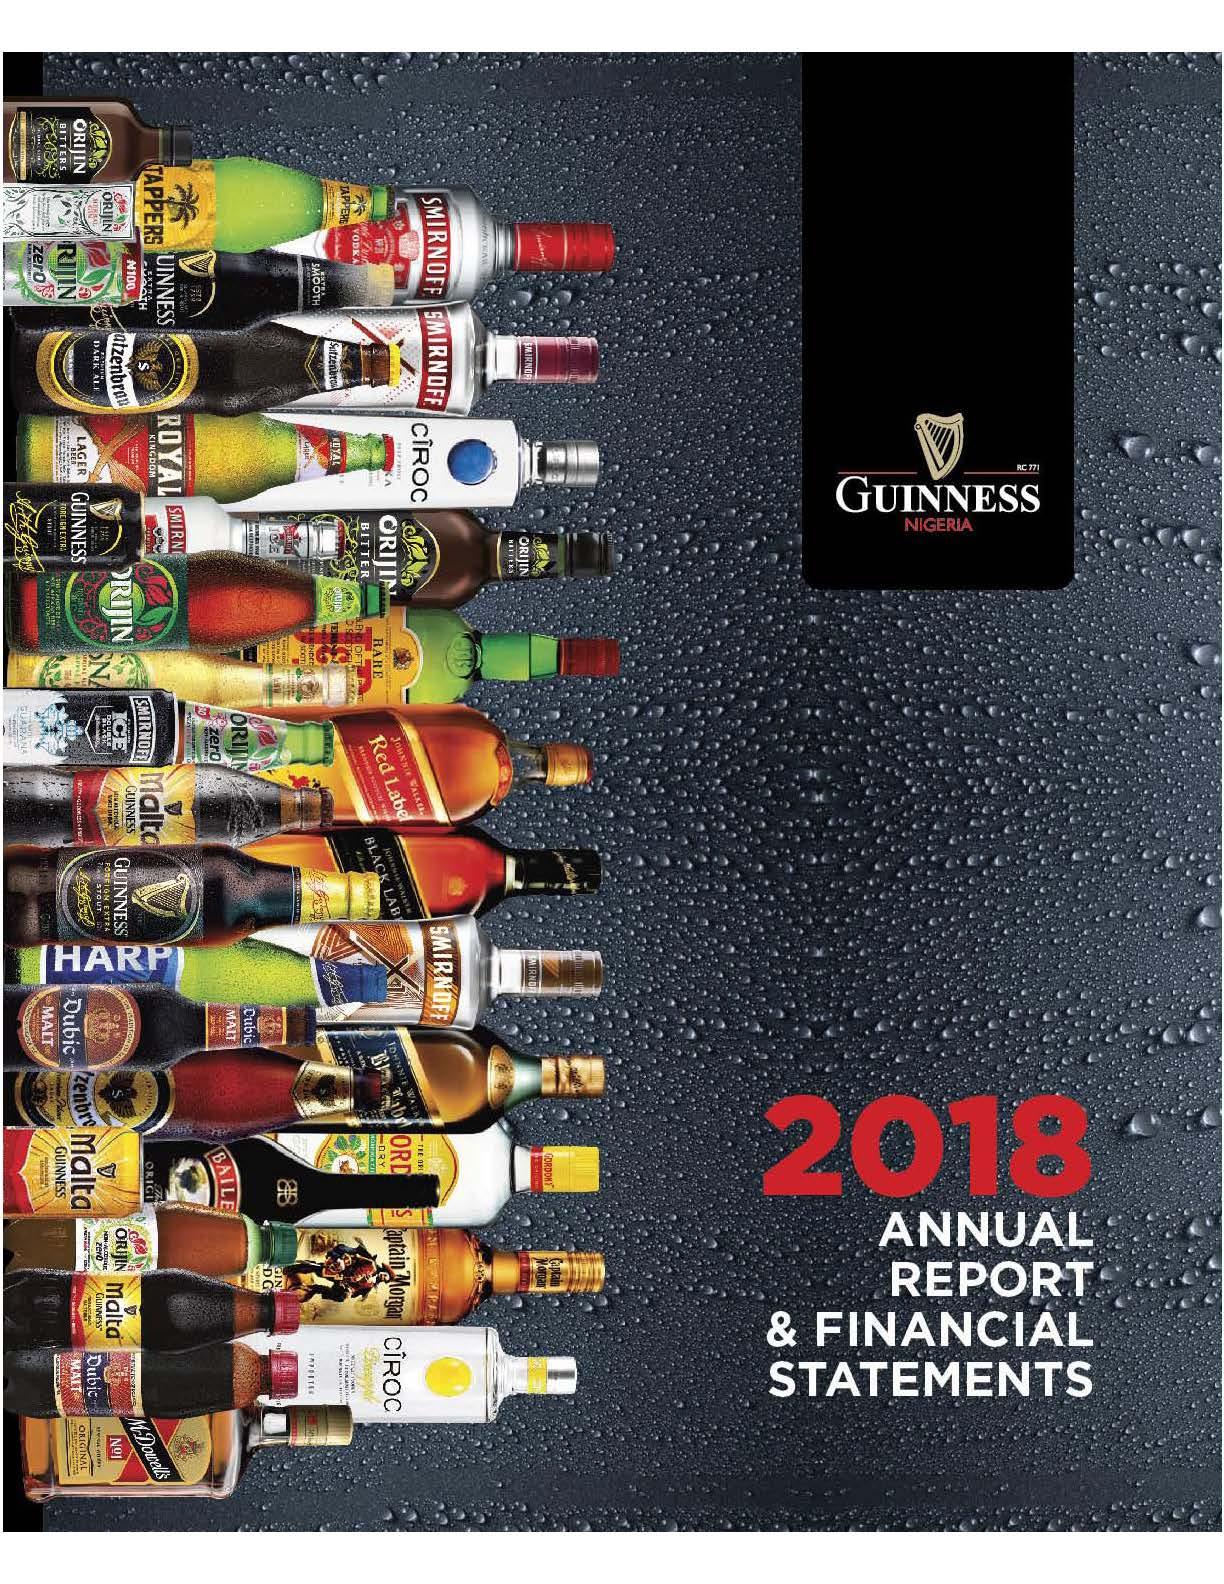 GUINNESS NIGERIA | 2018 ANNUAL REPORT